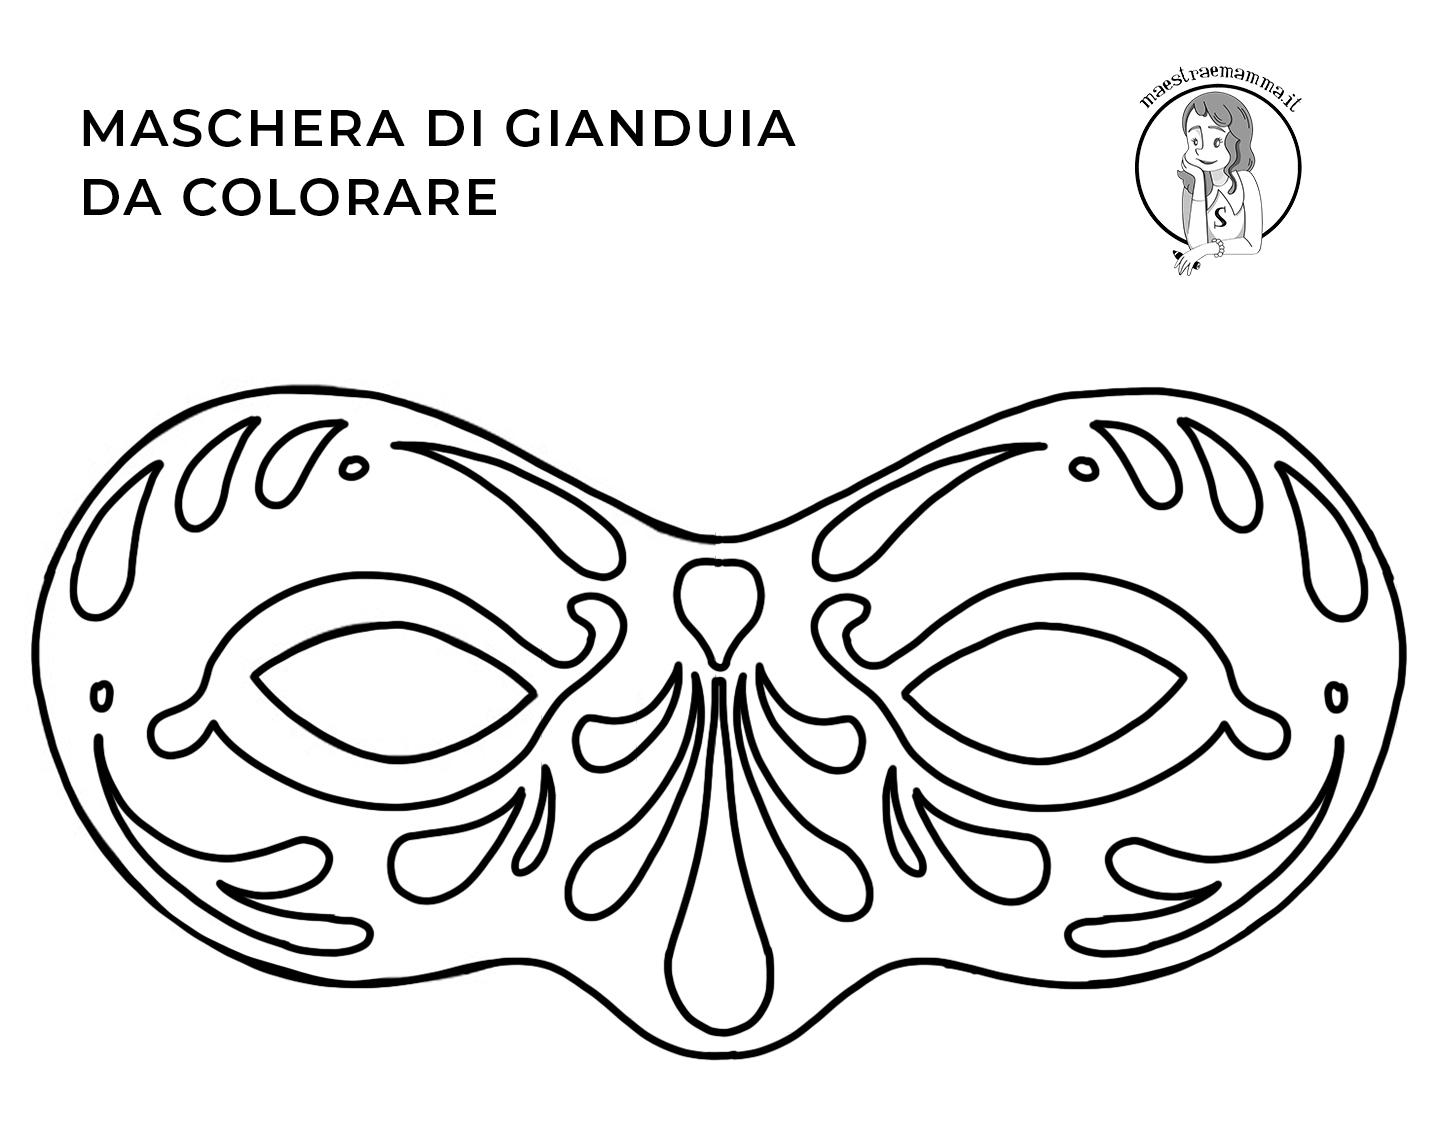 gianduia-Maschere di Carnevale da colorare e ritagliare